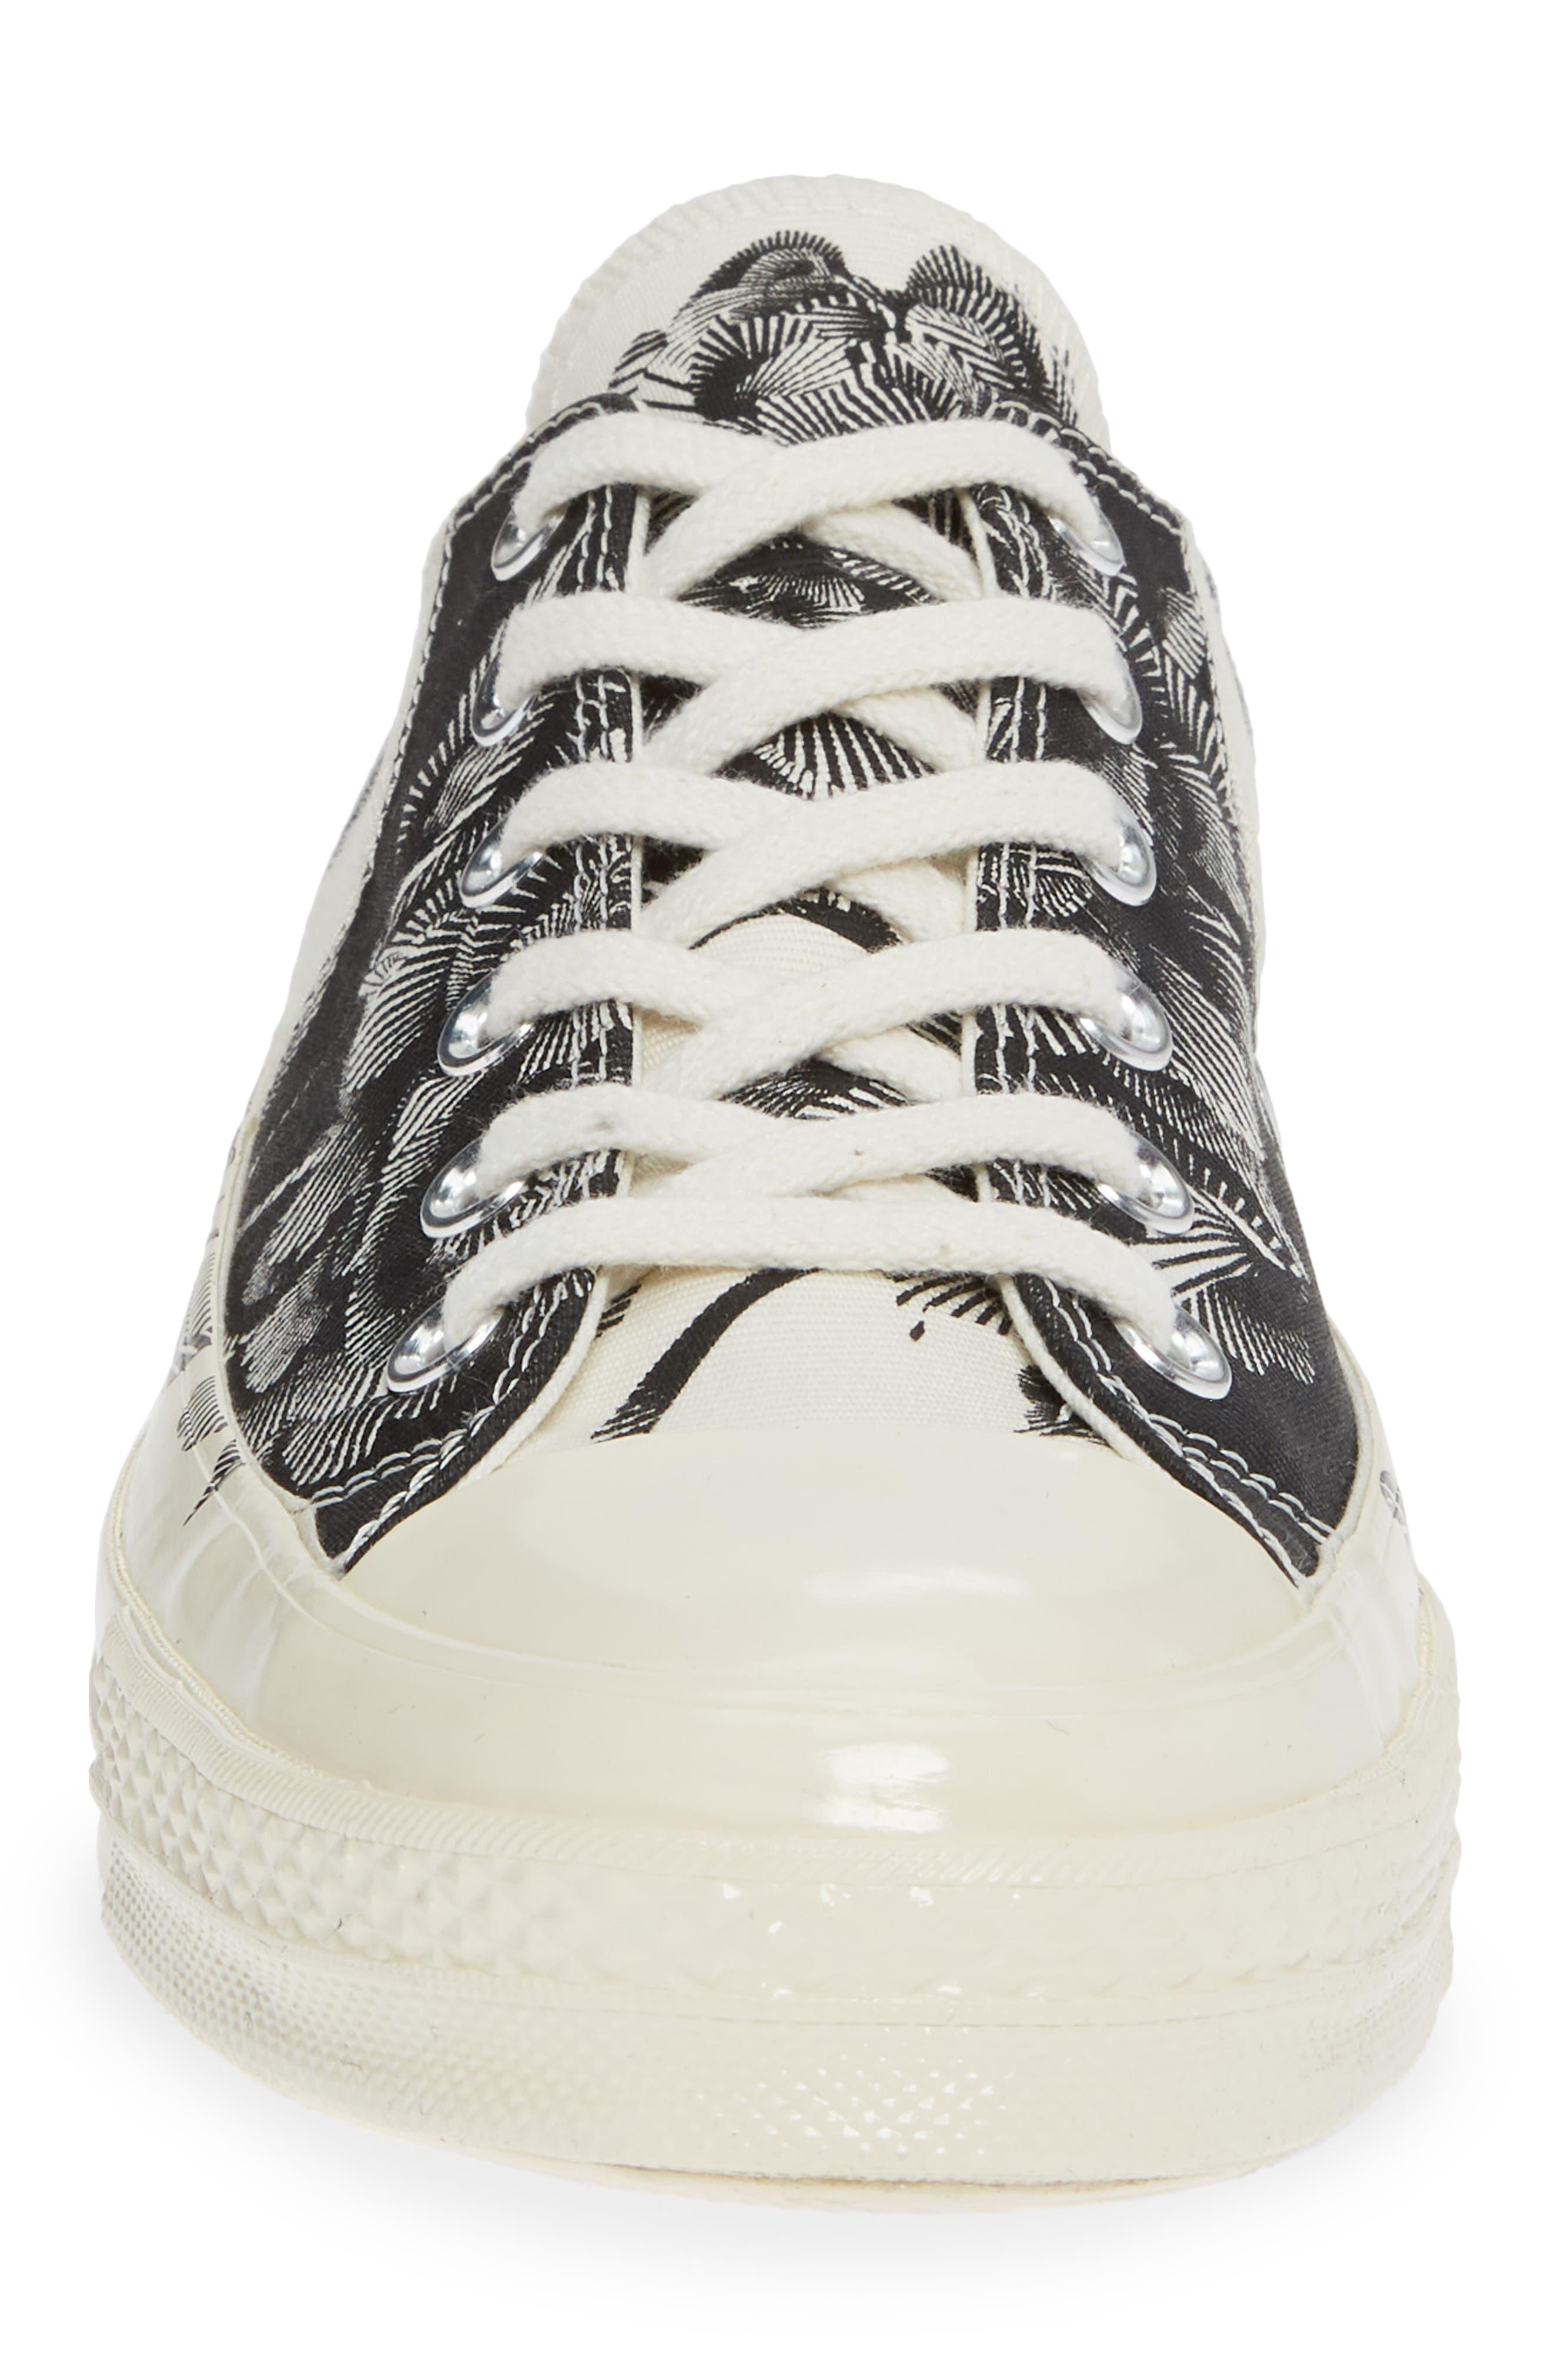 CT 70 Peony Low Top Sneaker,                             Alternate thumbnail 4, color,                             001